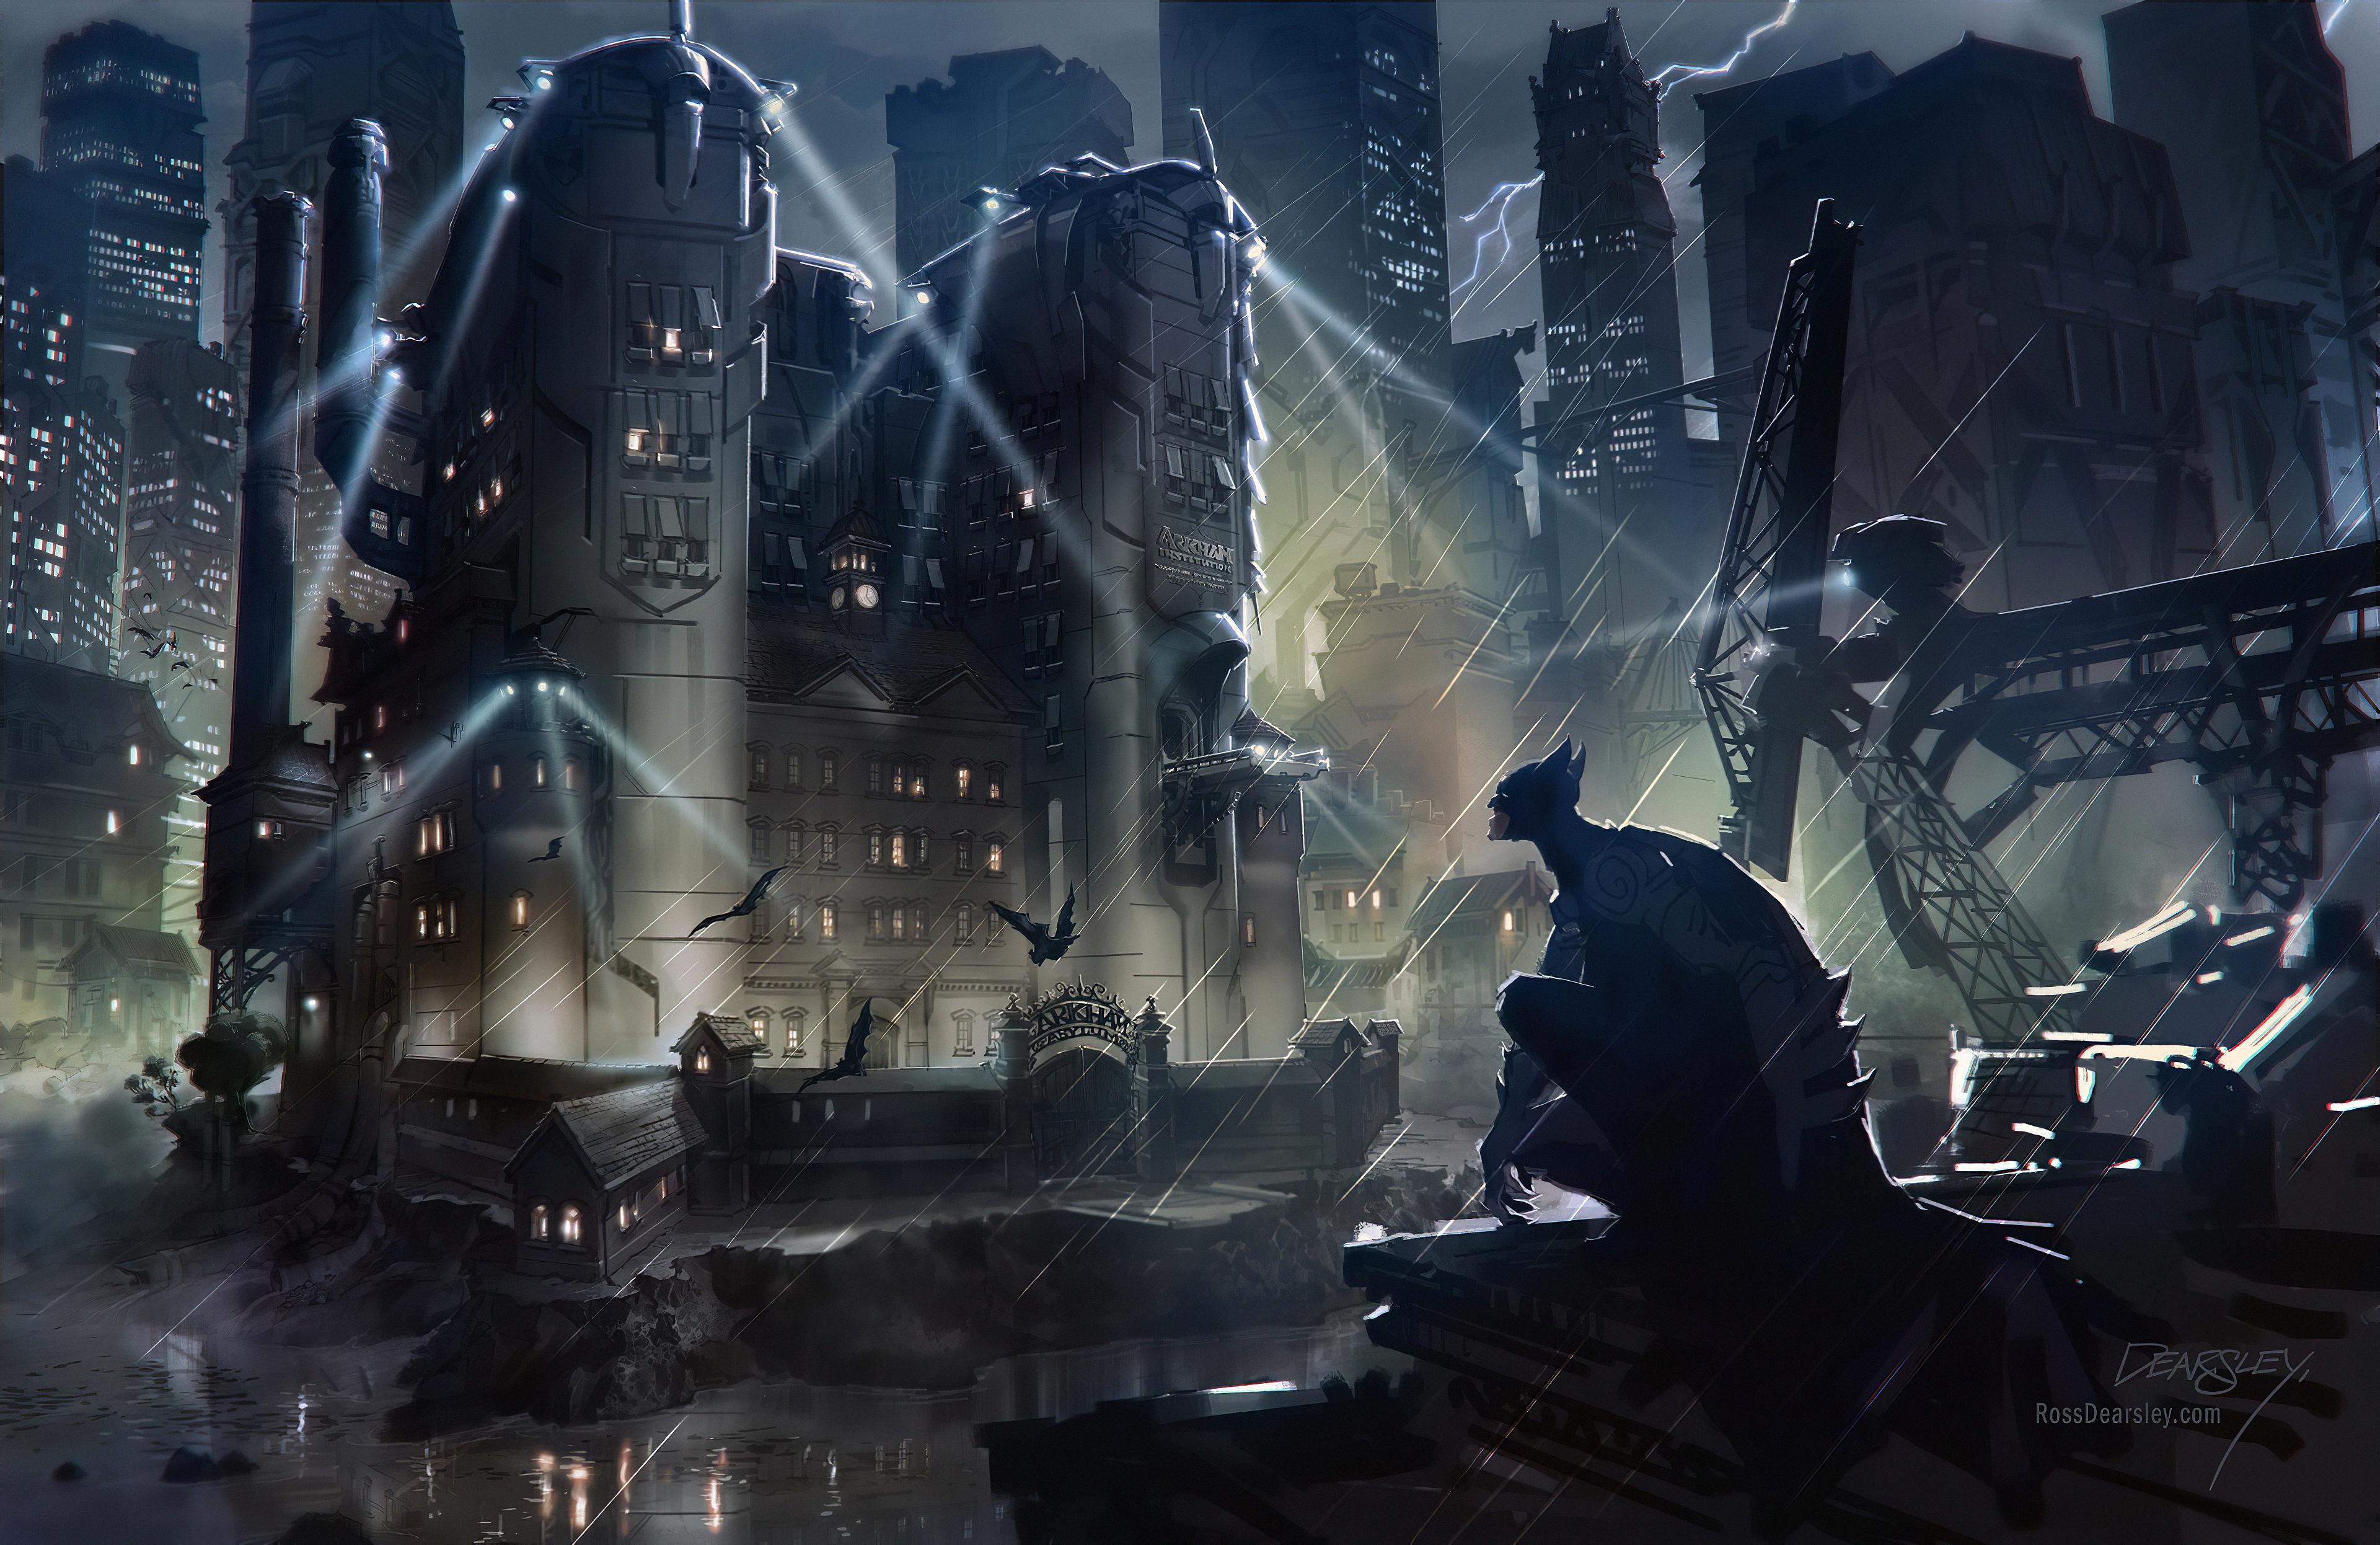 batman gotham city dark art 1580586121 - Batman Gotham City Dark Art - Batman Gotham City Dark Art wallpapers, Batman Gotham City 4k wallpapers